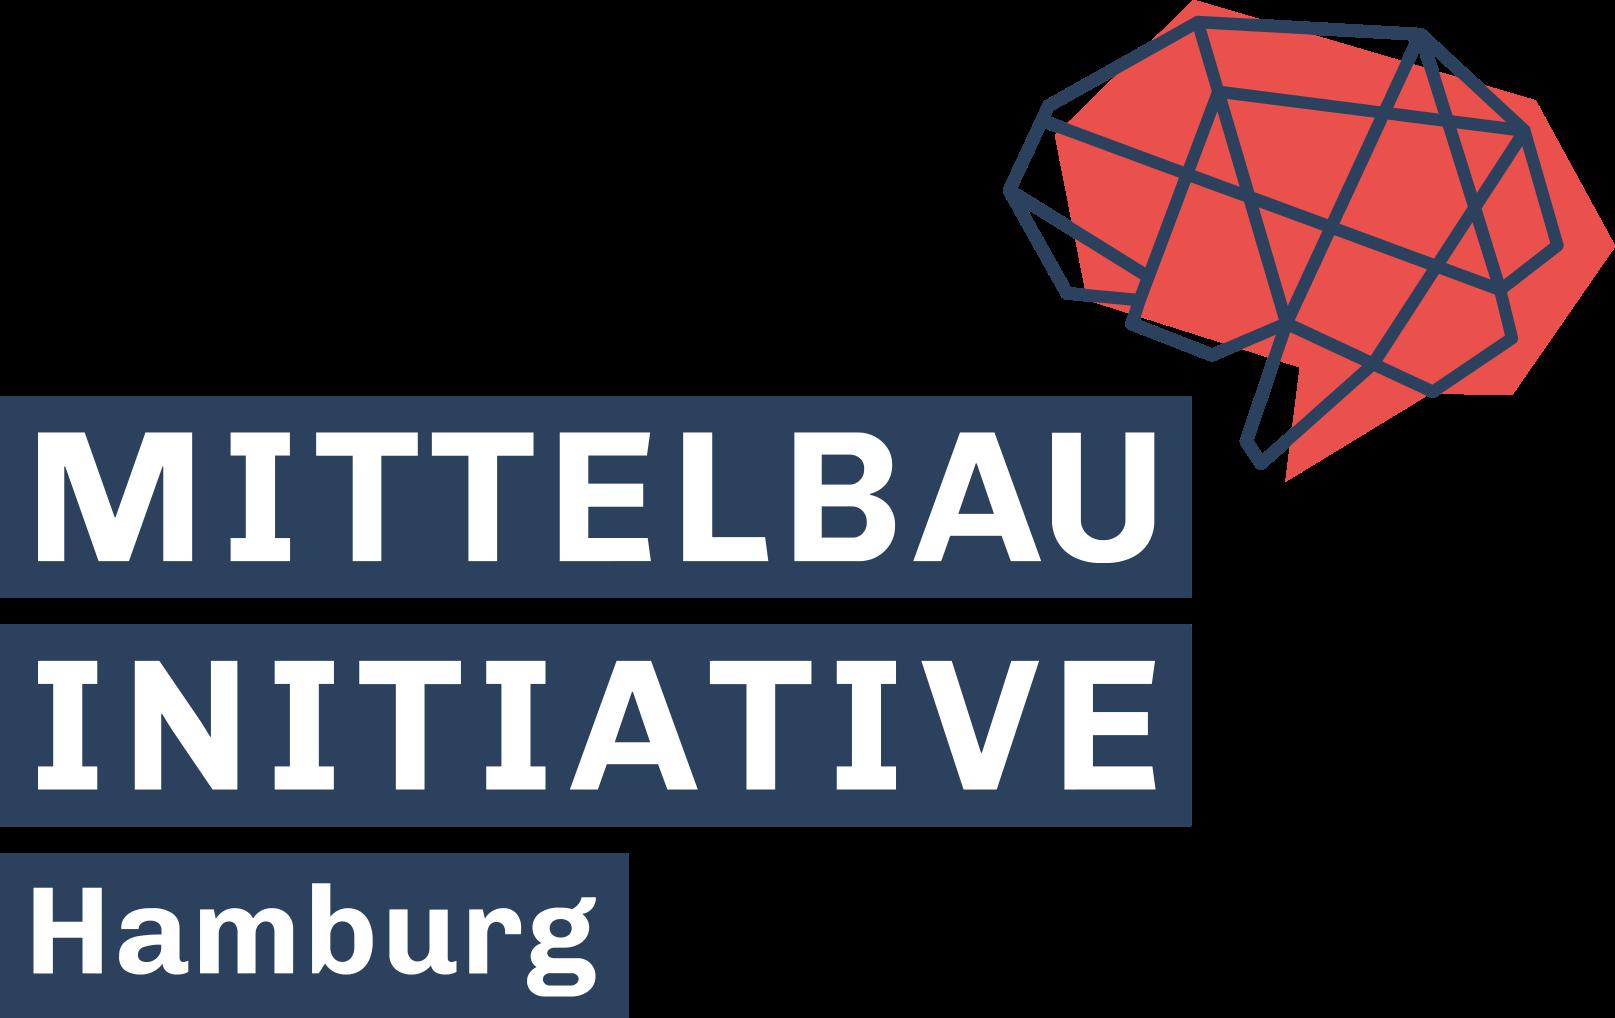 Mittelbauinitiative Hamburg